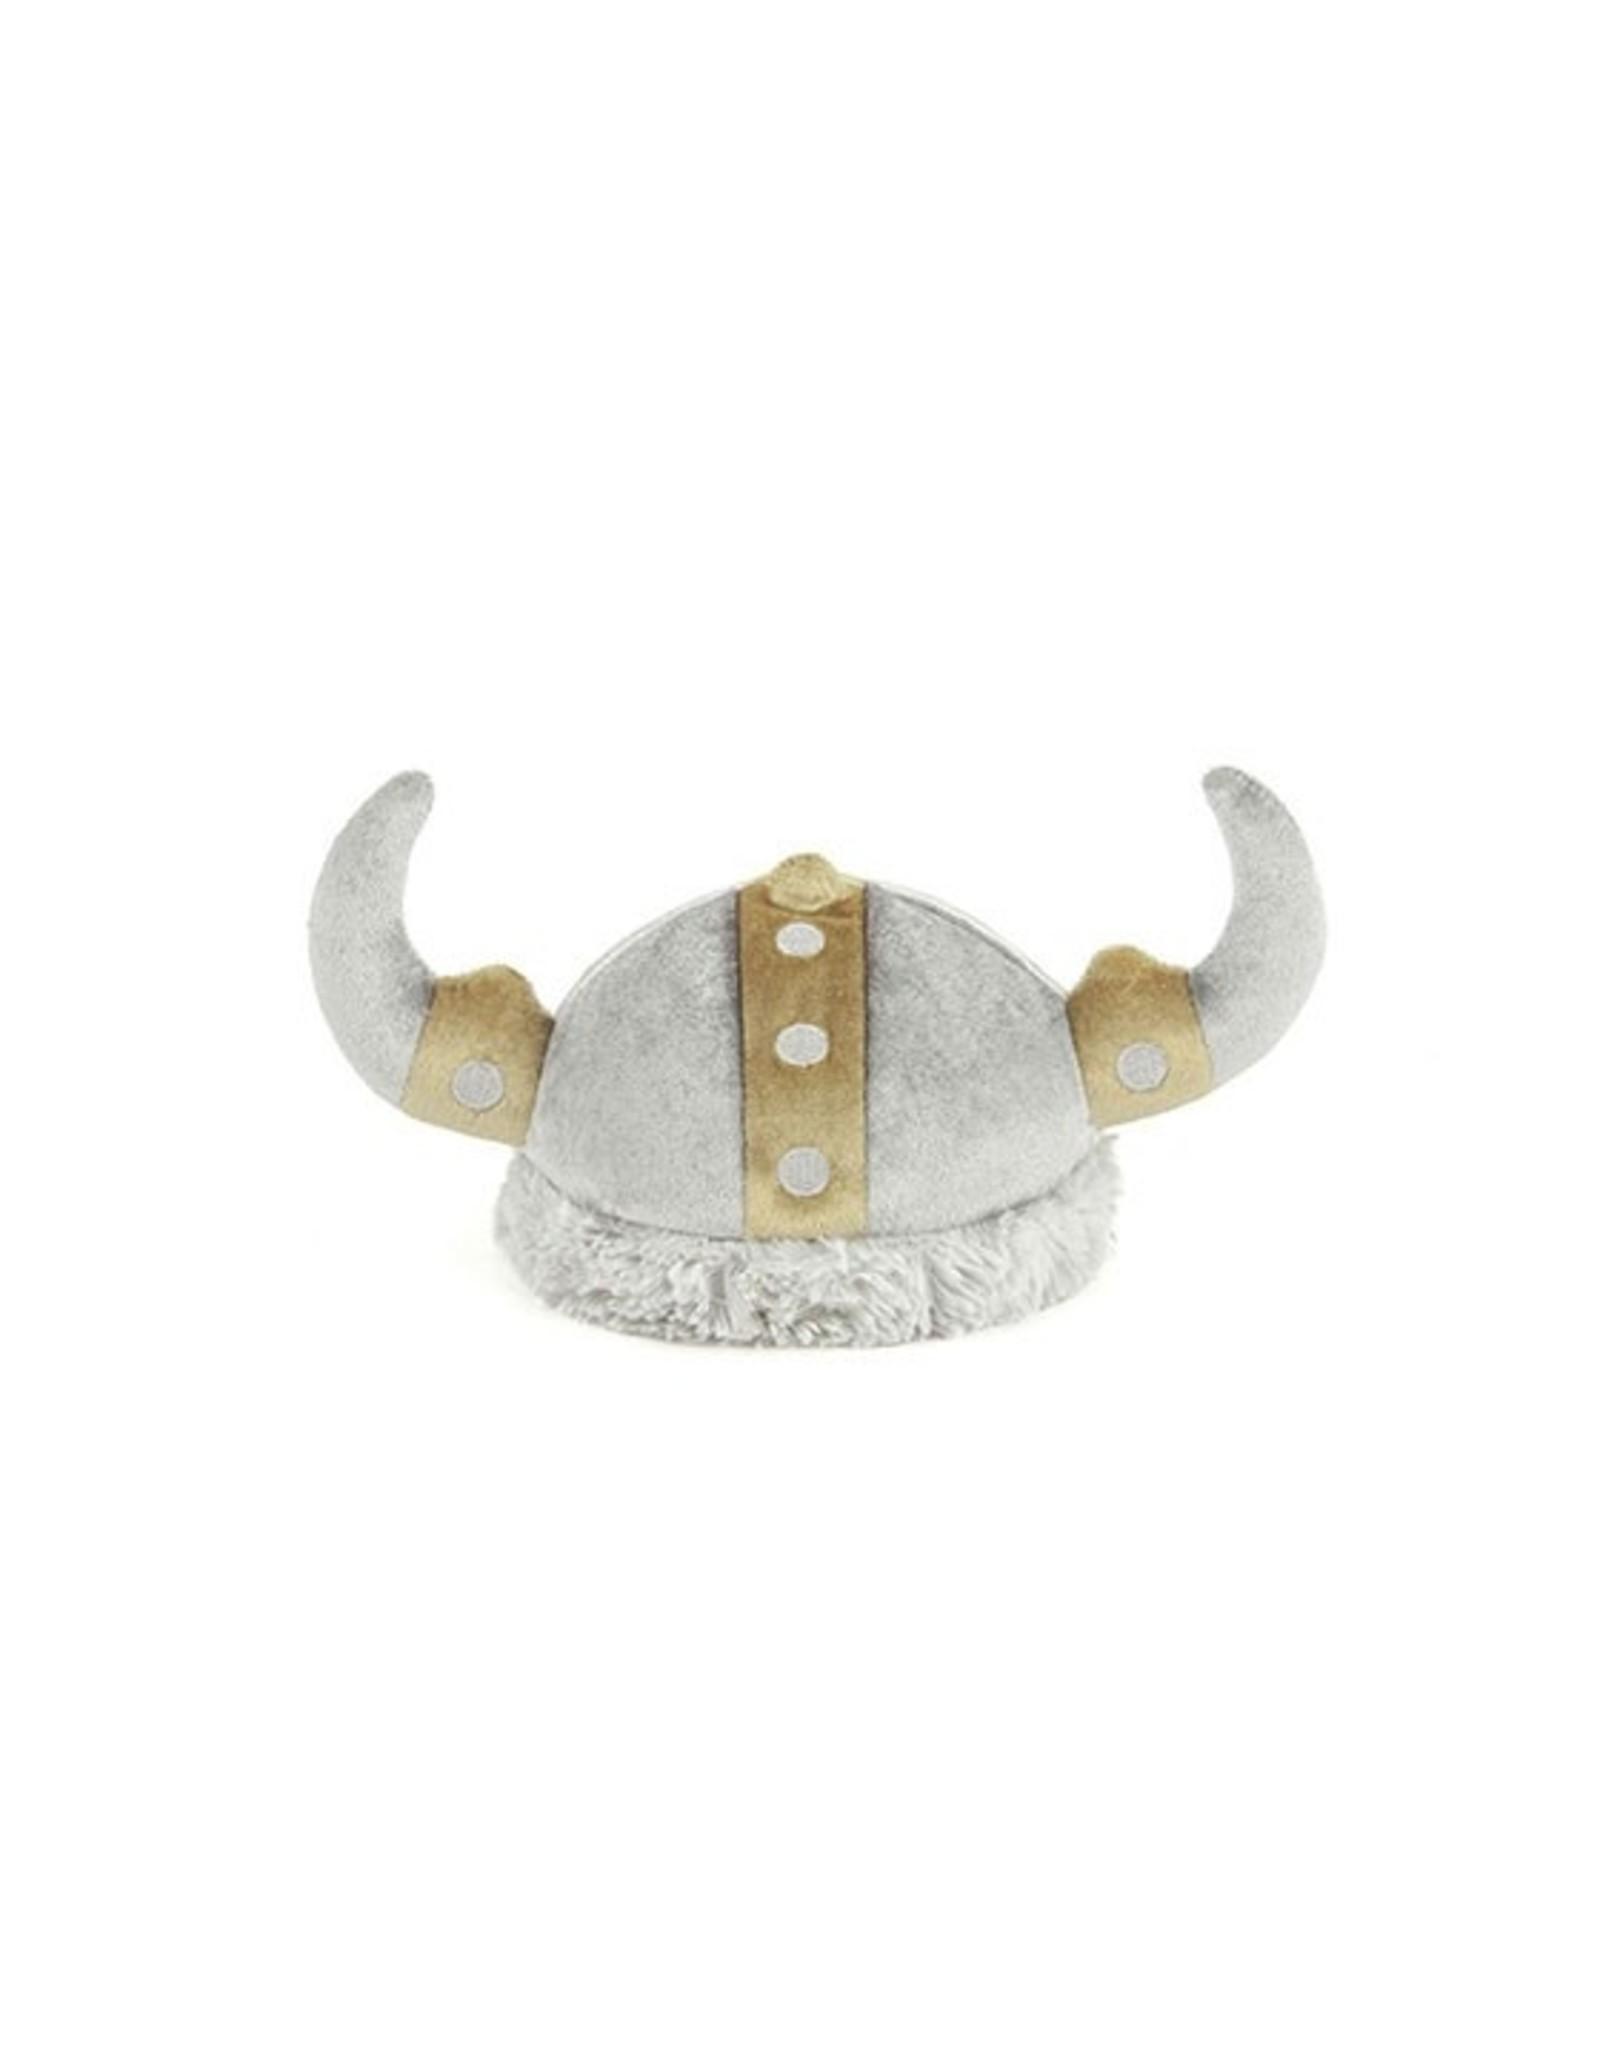 PLAY PLAY Mutt Hatter Viking